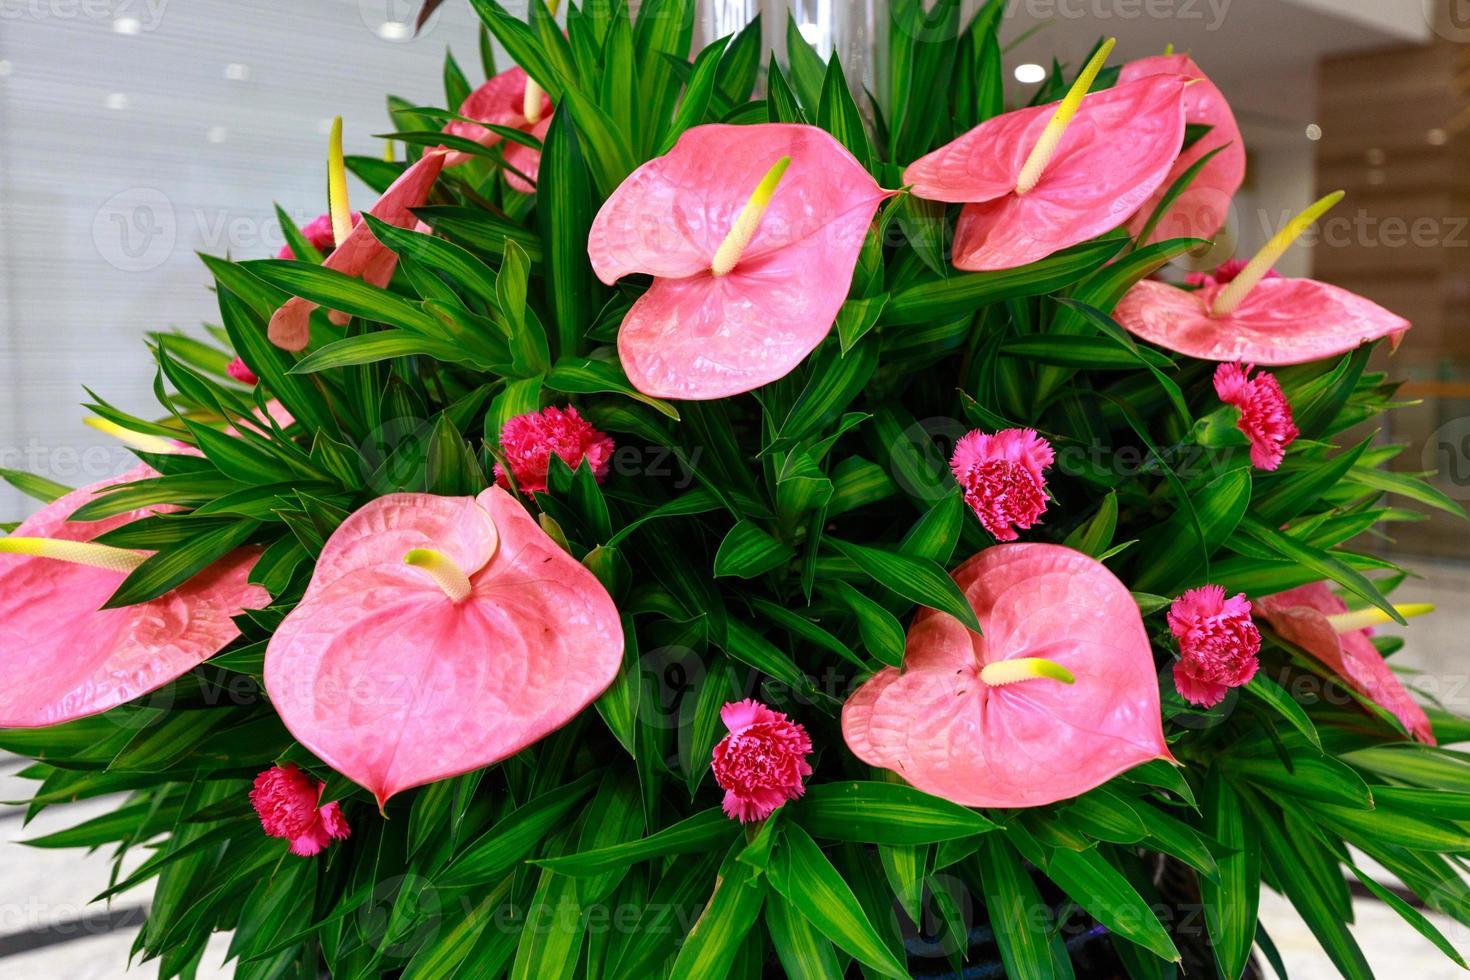 fiore di anthurium foto